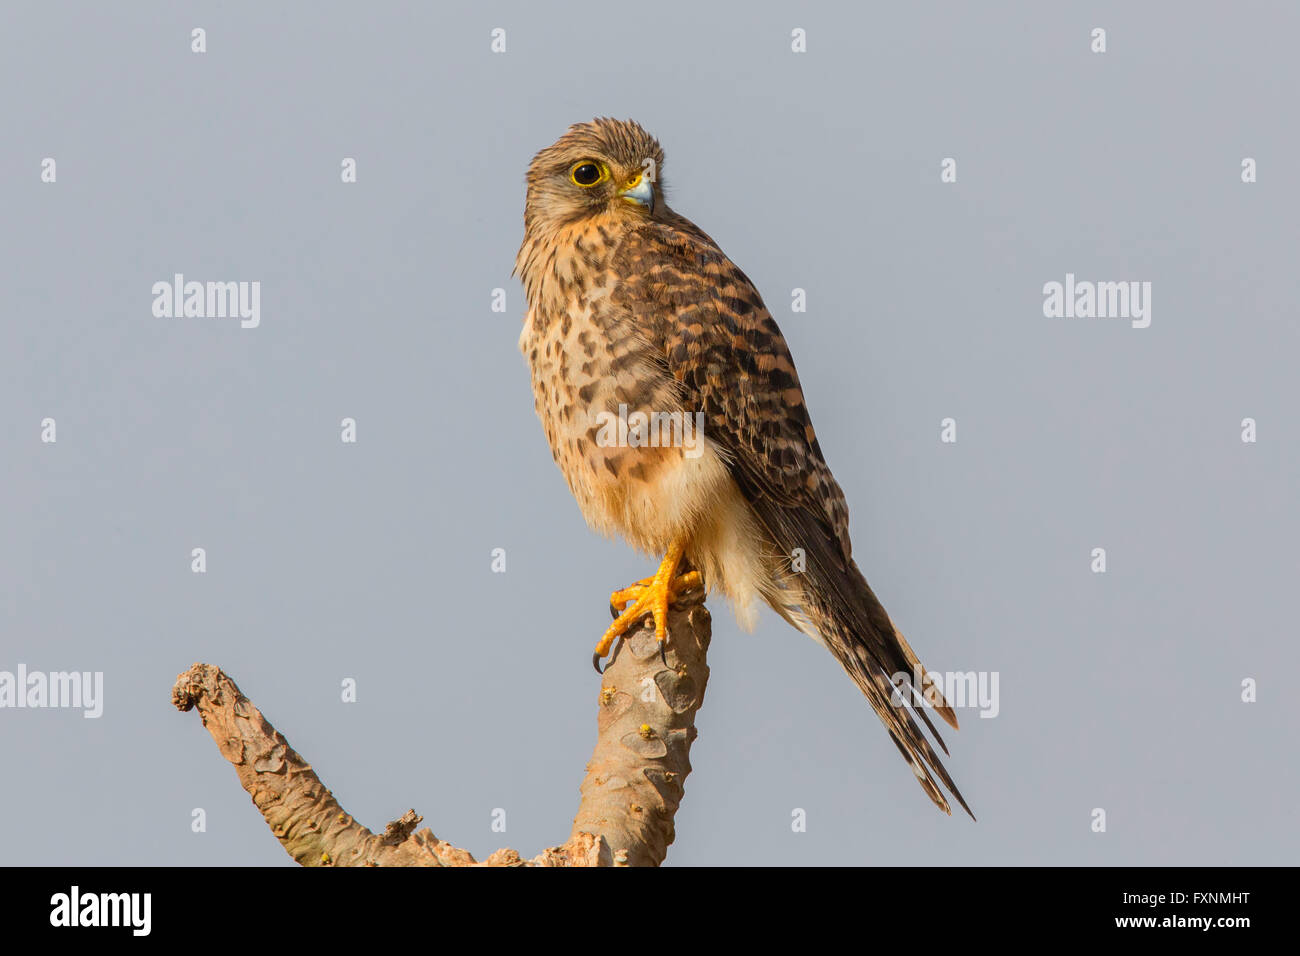 Neglected Kestrel (Falco tinnunculus neglectus), perched on a branch, Sao Nicolau, Cape Verde - Stock Image